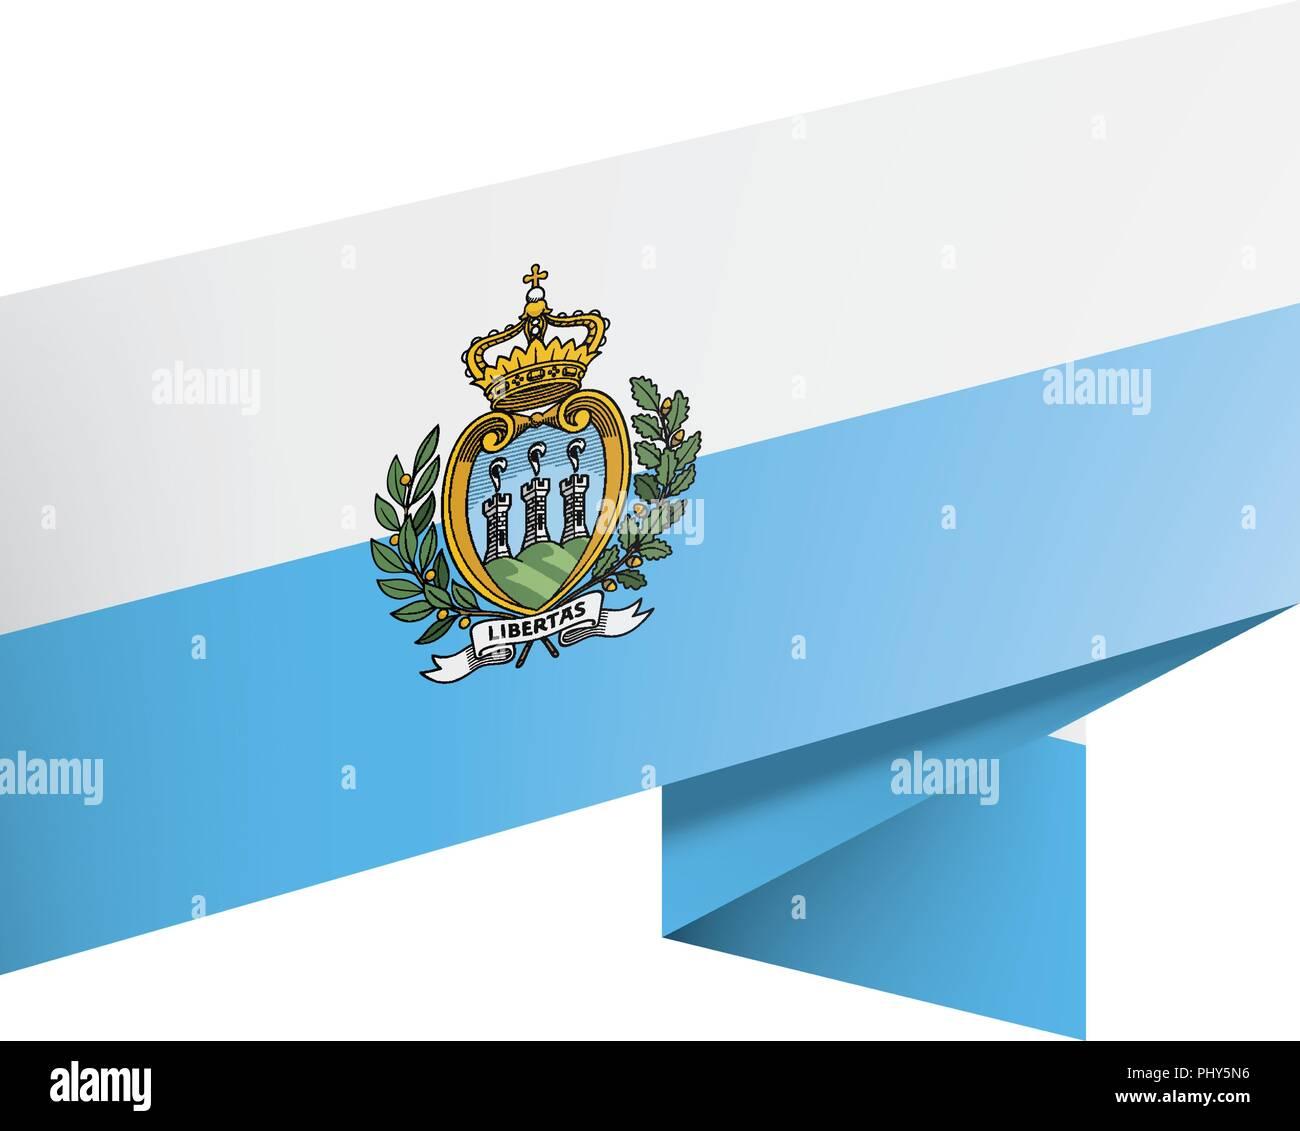 San Marino flag, vector illustration on a white background - Stock Image